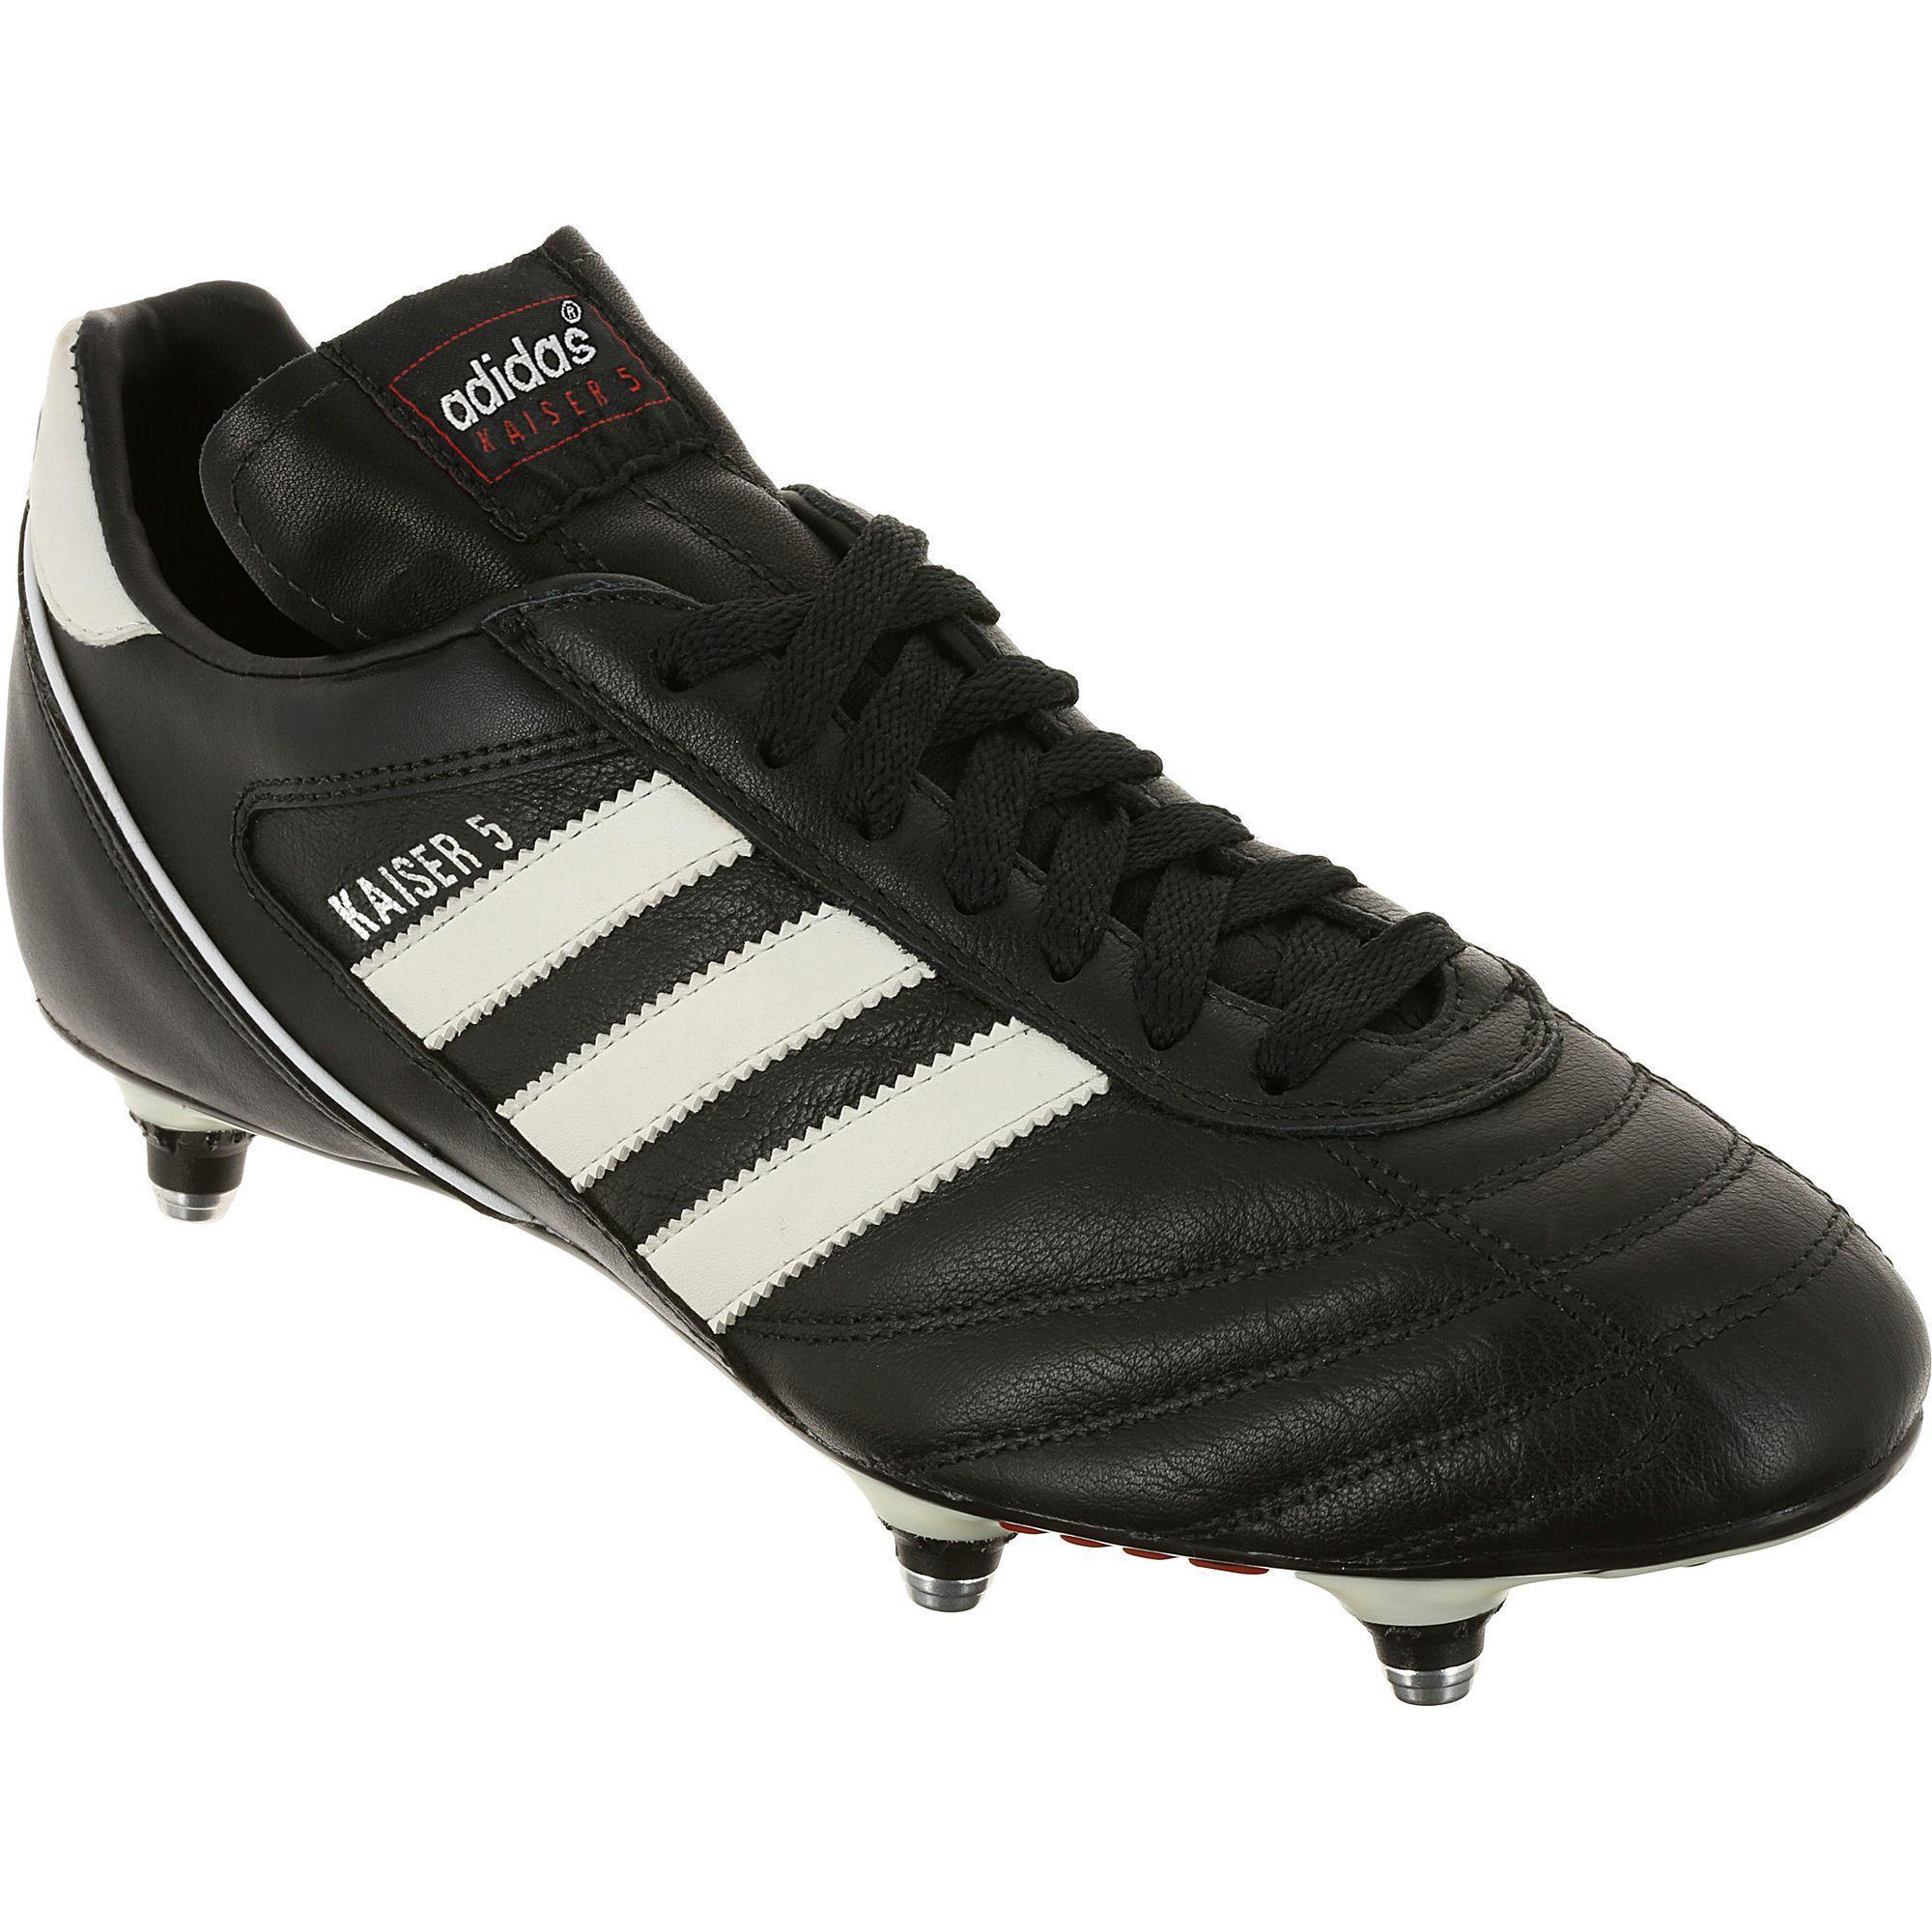 Adidas Voetbalschoenen Kaiser 5 Cup SG voor volwassenen zwart